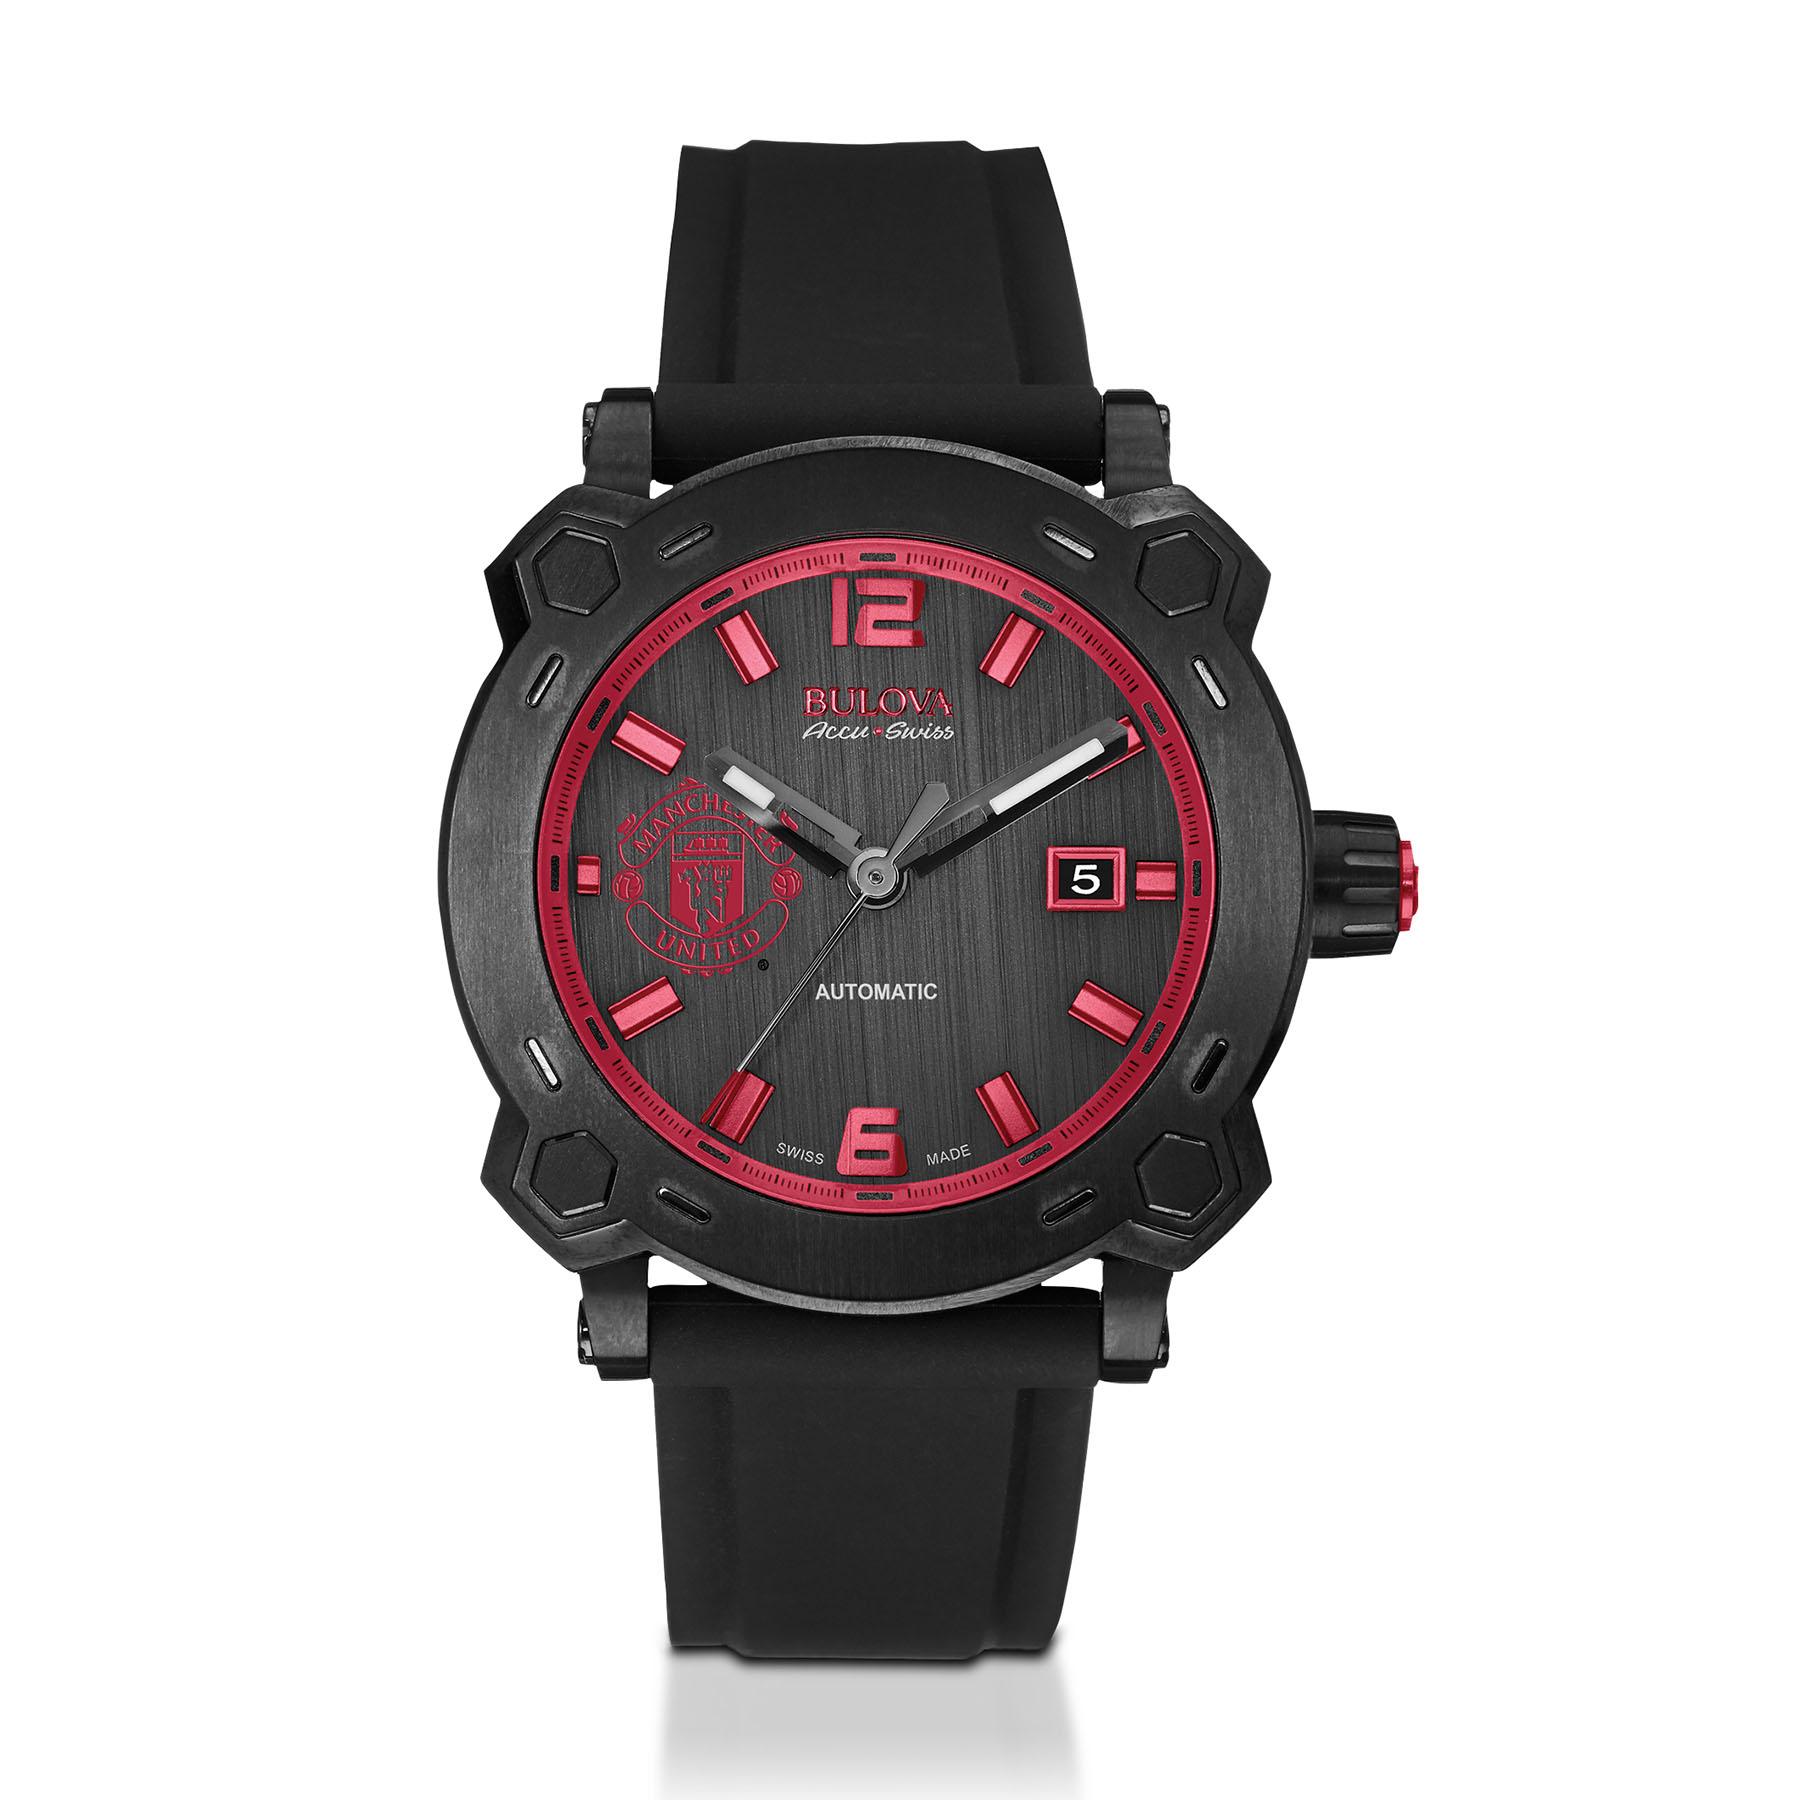 Manchester United Bulova Accu.Swiss Titanium Watch - Black Dial with Red Crest